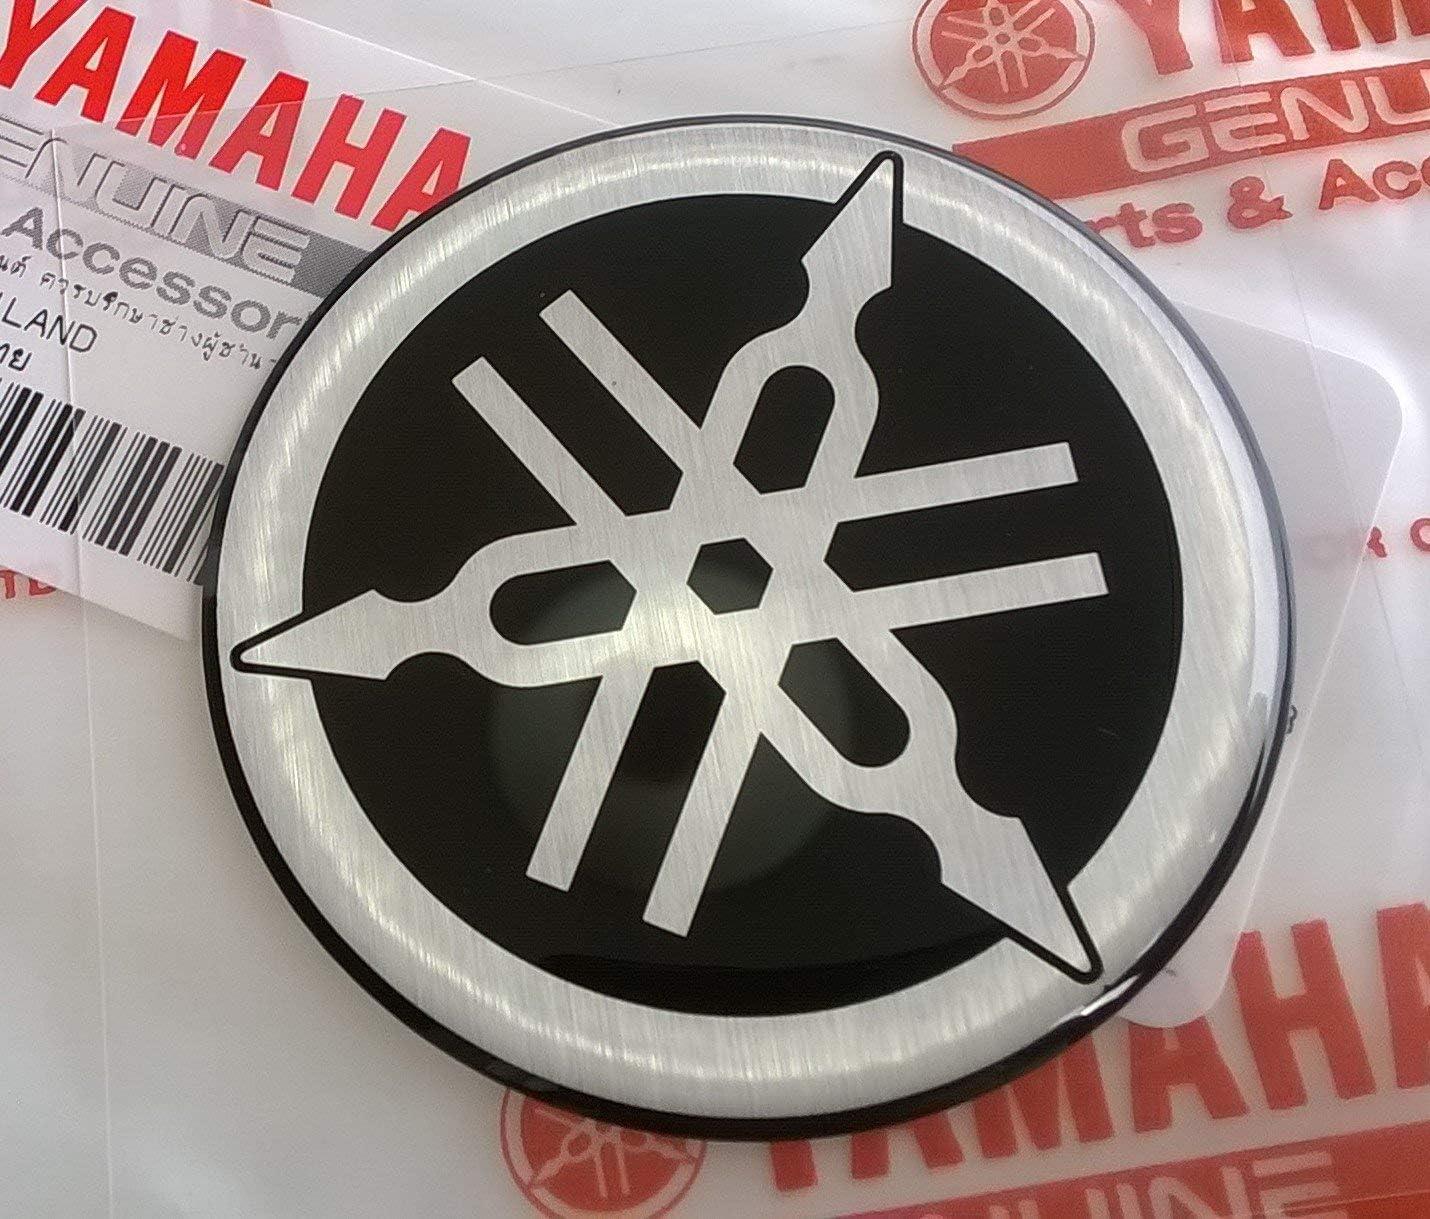 Snowmobile Jet Ski ATV 100/% GENUINE 30mm Diameter YAMAHA TUNING FORK Decal Sticker Emblem Logo RED Raised Domed Gel Resin Self Adhesive Motorcycle